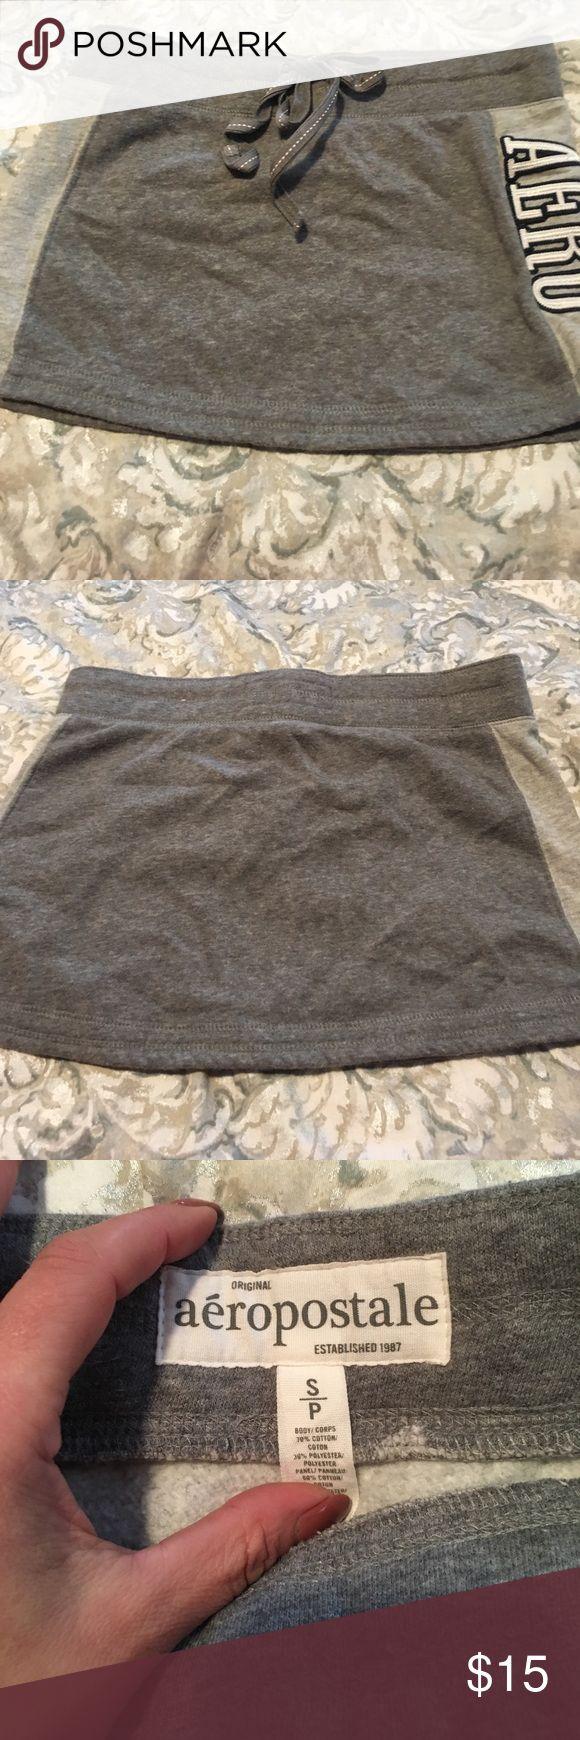 Aeropostale skirt Cotton mini skirt Aeropostale Skirts Mini